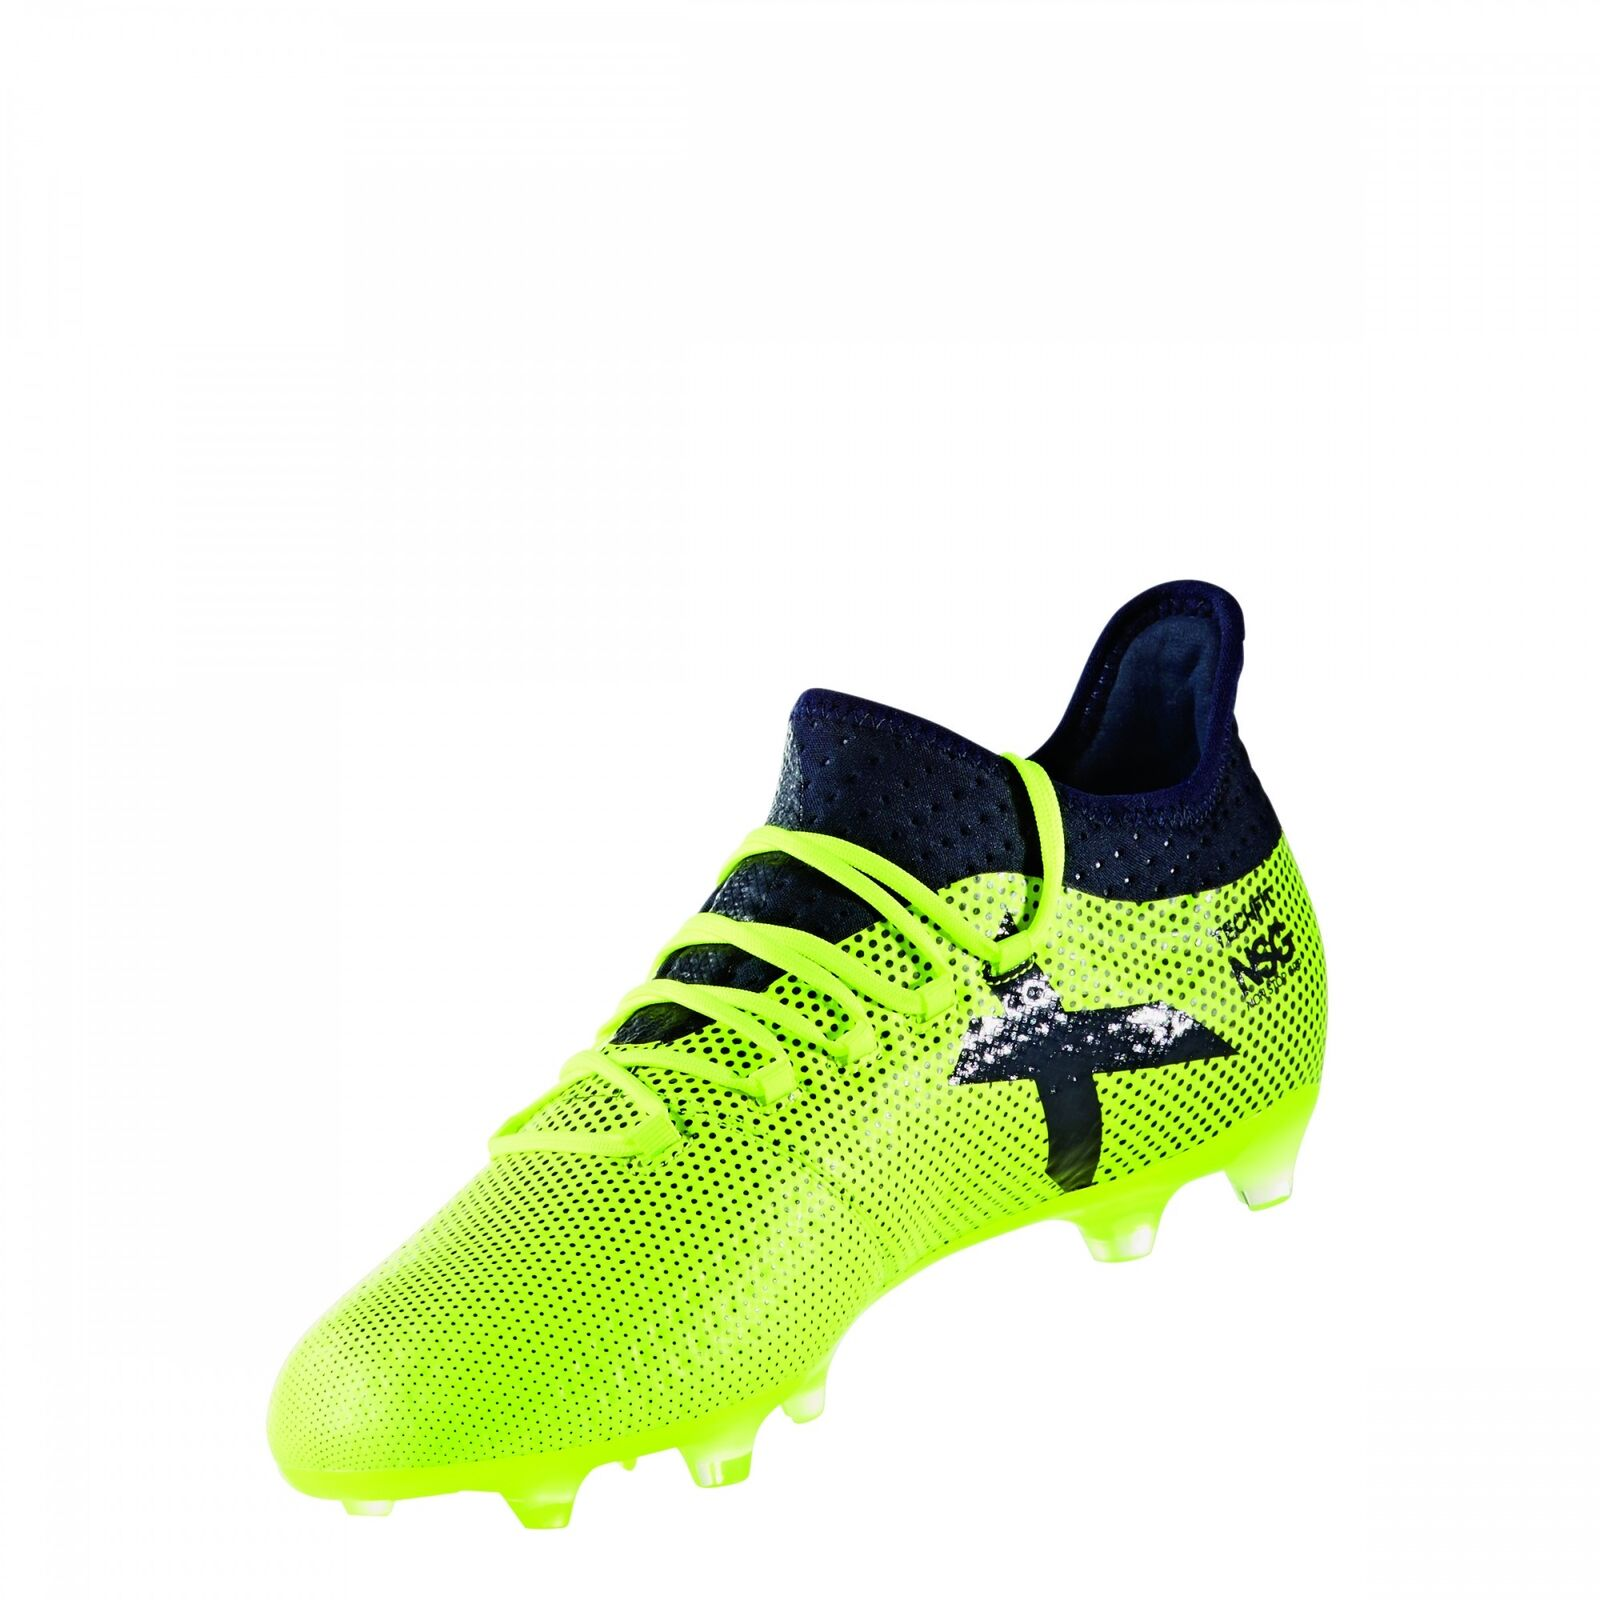 Adidas Football Boots x 17.2 Fg Football Boots Training shoes